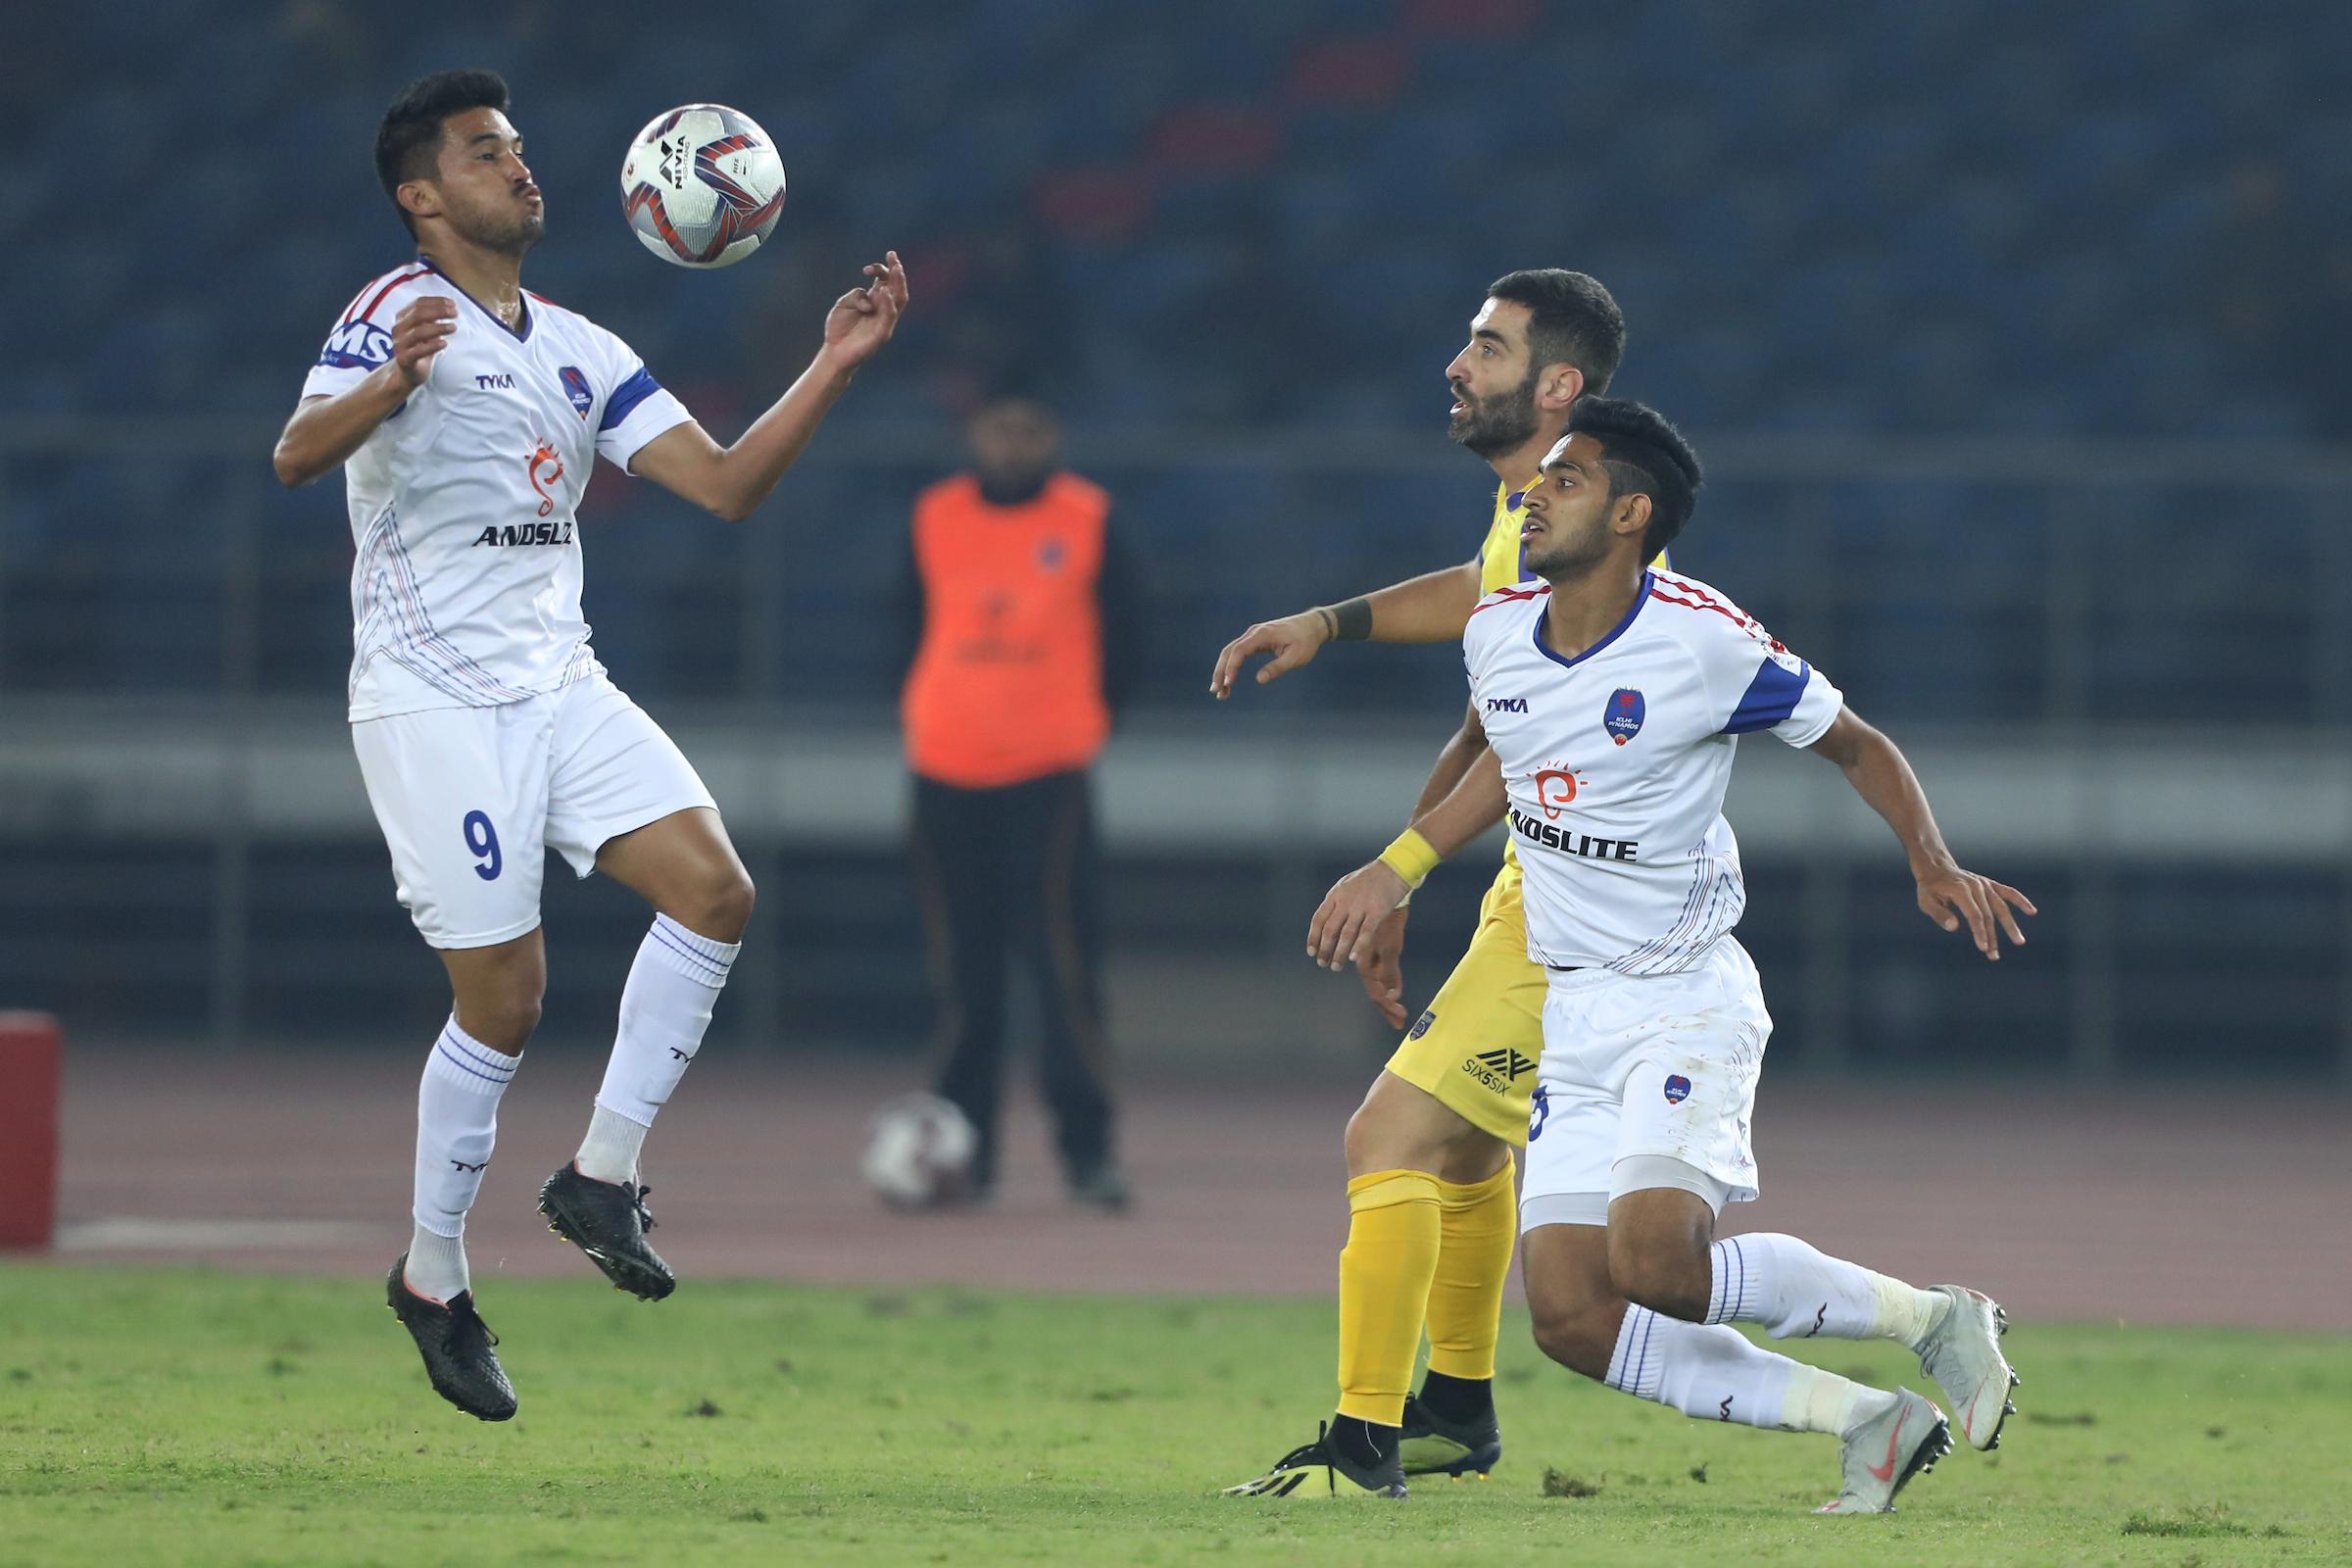 Ulises Davila Delhi Dynamos Kerala Blasters